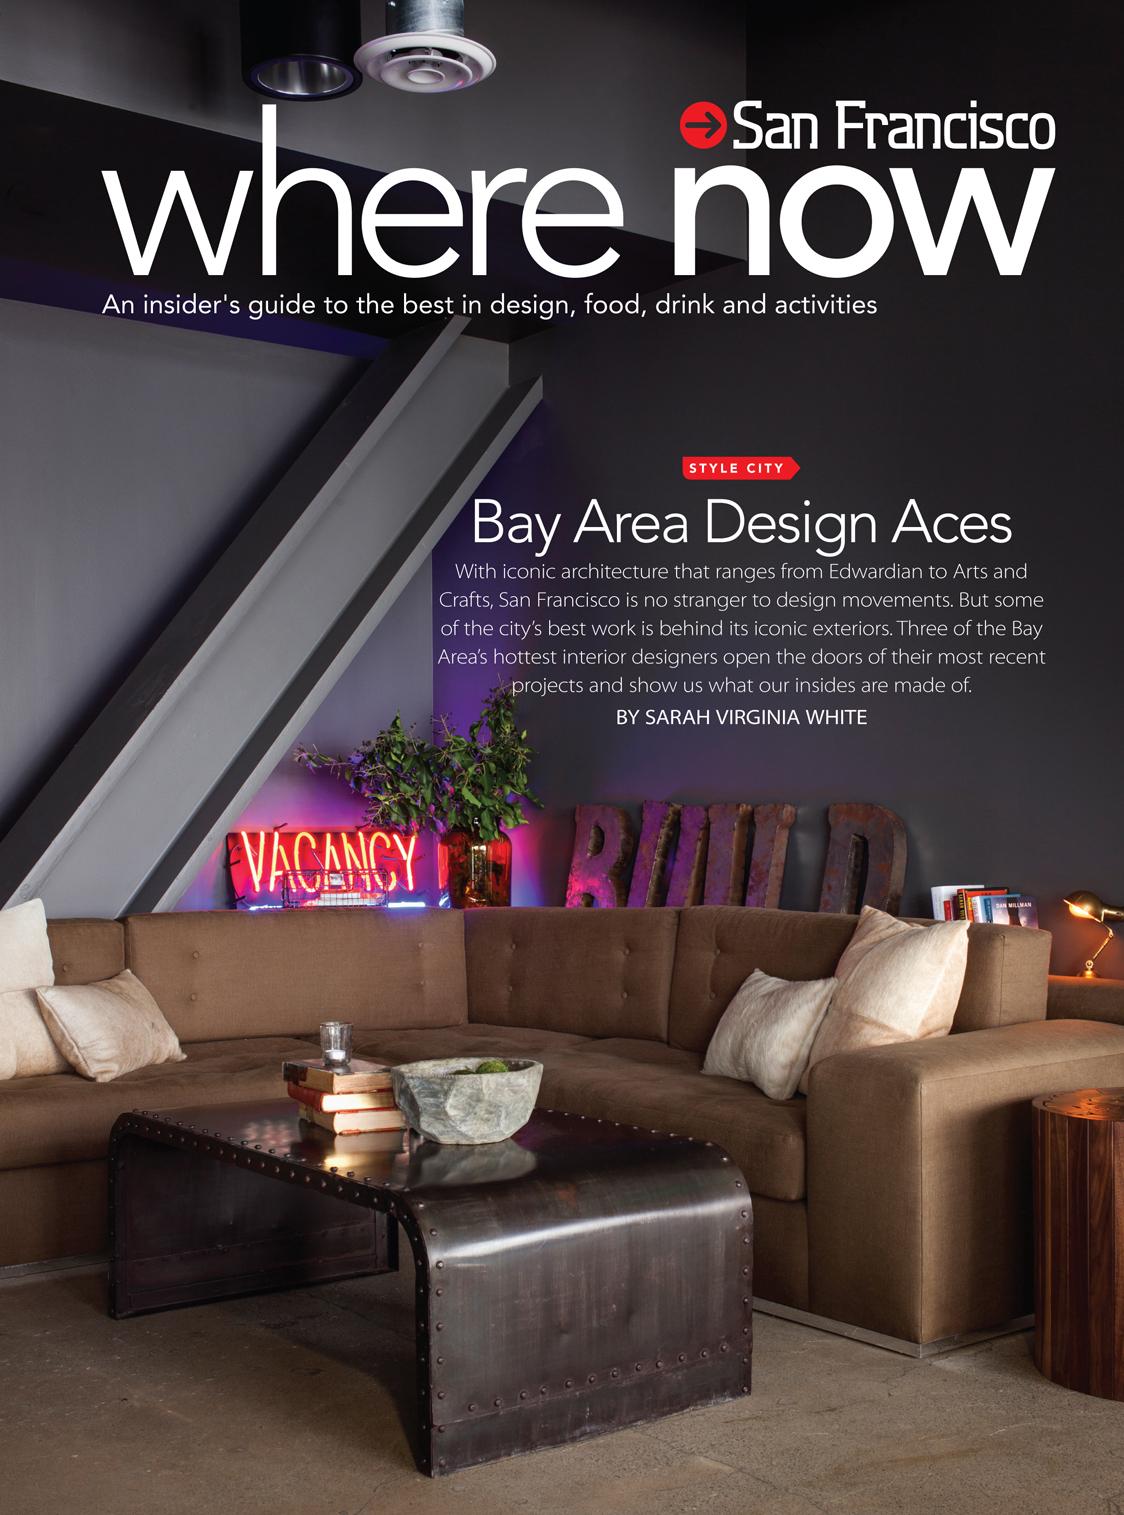 Where Bay Area Design Aces